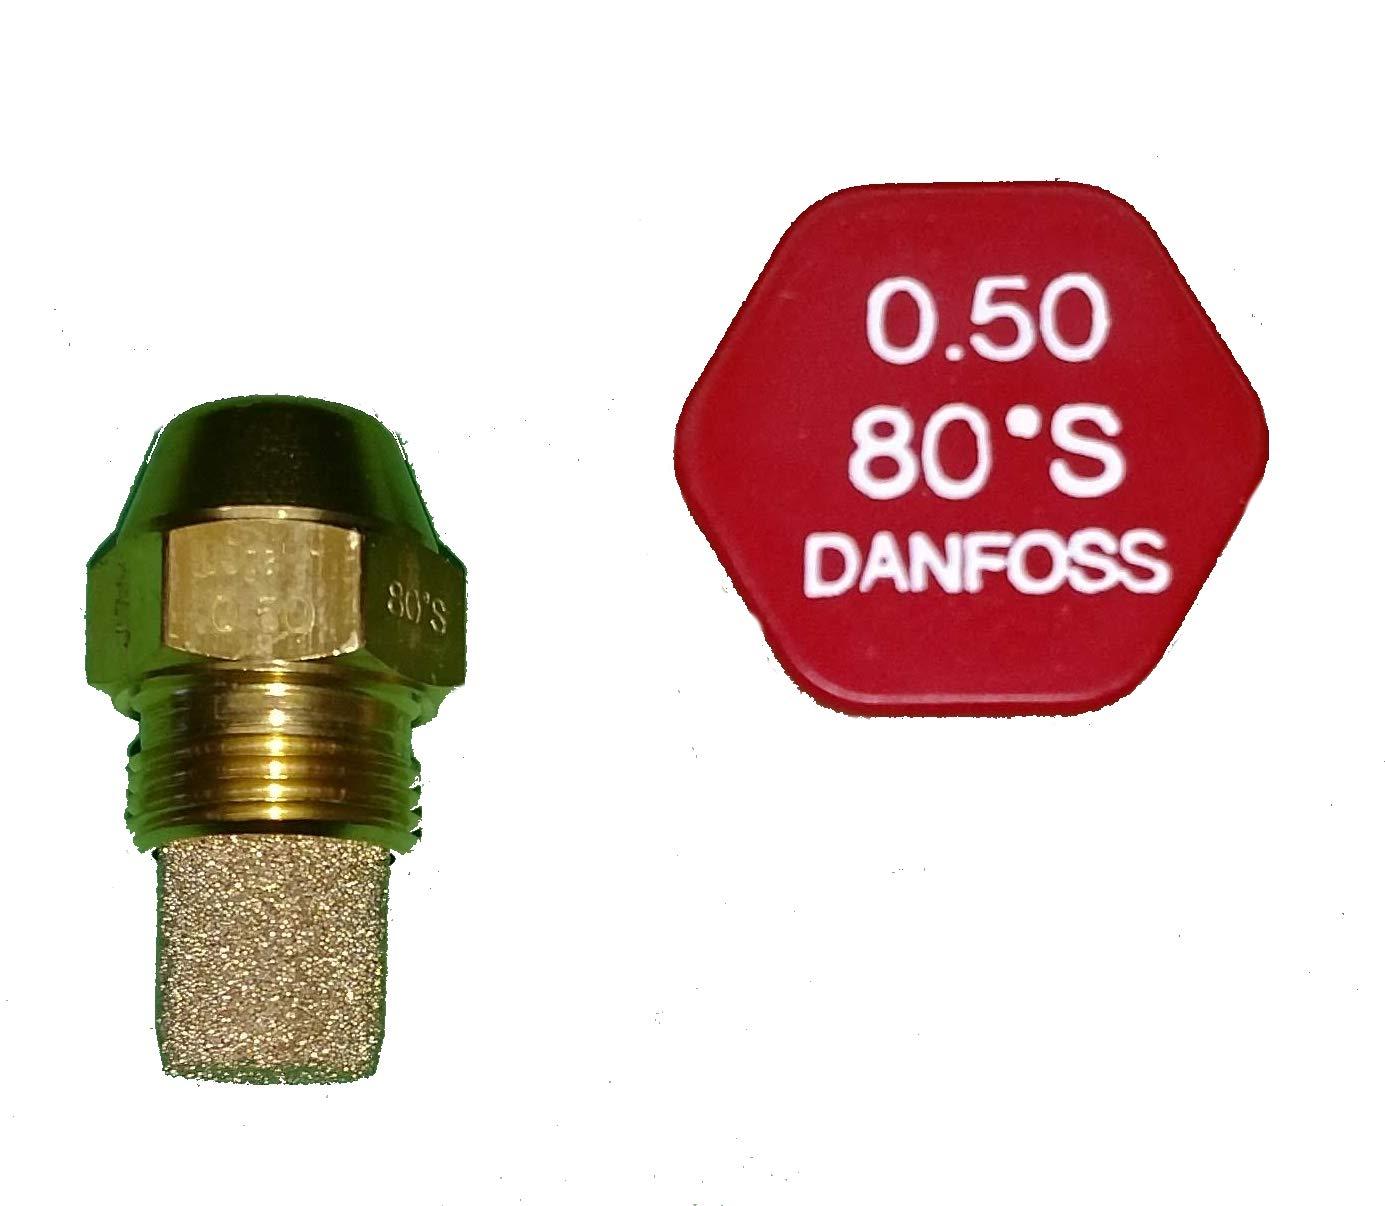 OD 80 degr/és S . Danfoss Buse 0.50 gph